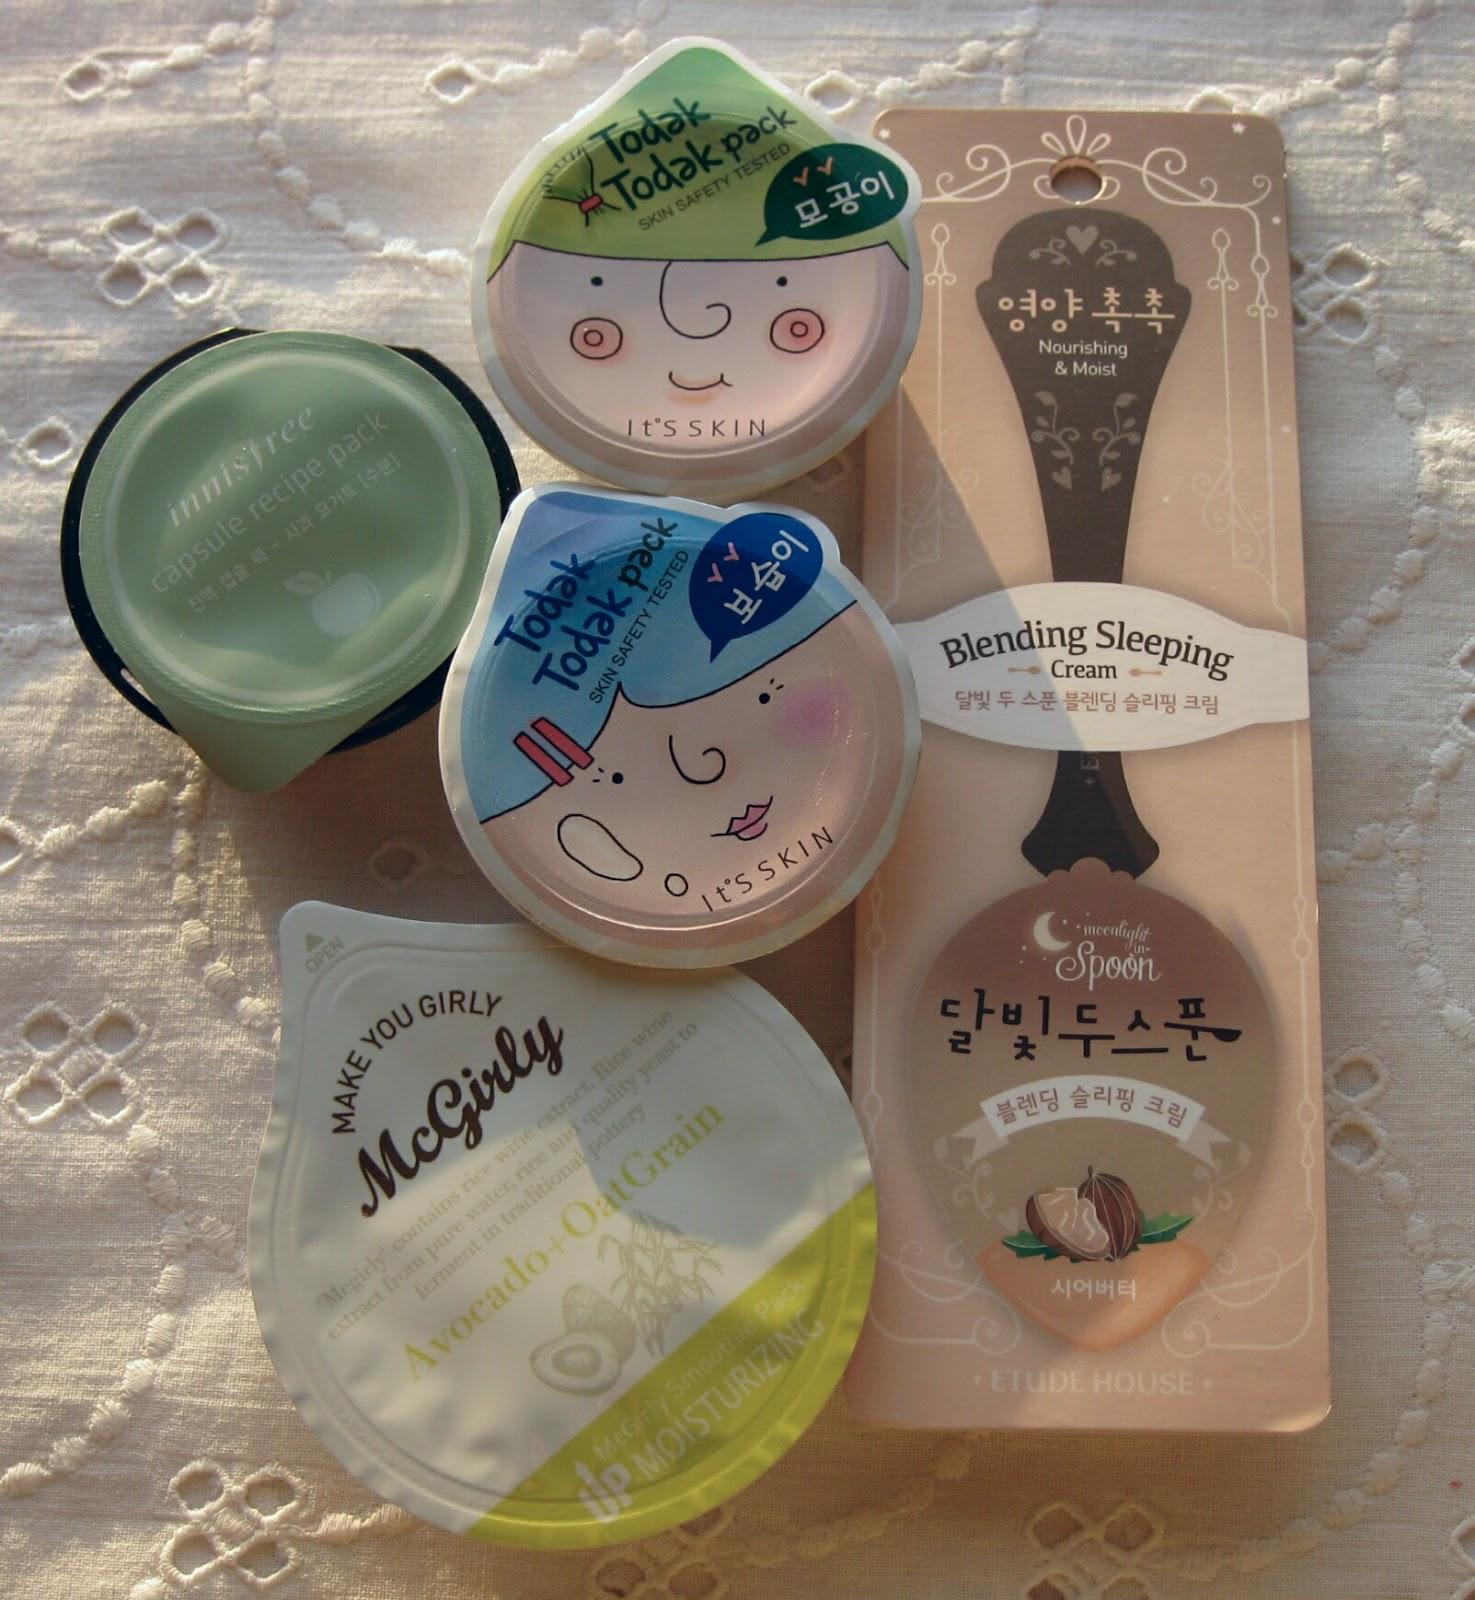 It's Skin Todak Todak Pack Pore Moisture, Too Cool For School Mcgirly Smoothie Pack , INNISFREE Capsule Recipe Pack, ETUDE HOUSE Moonlight In Spoon Blending Sleeping Cream